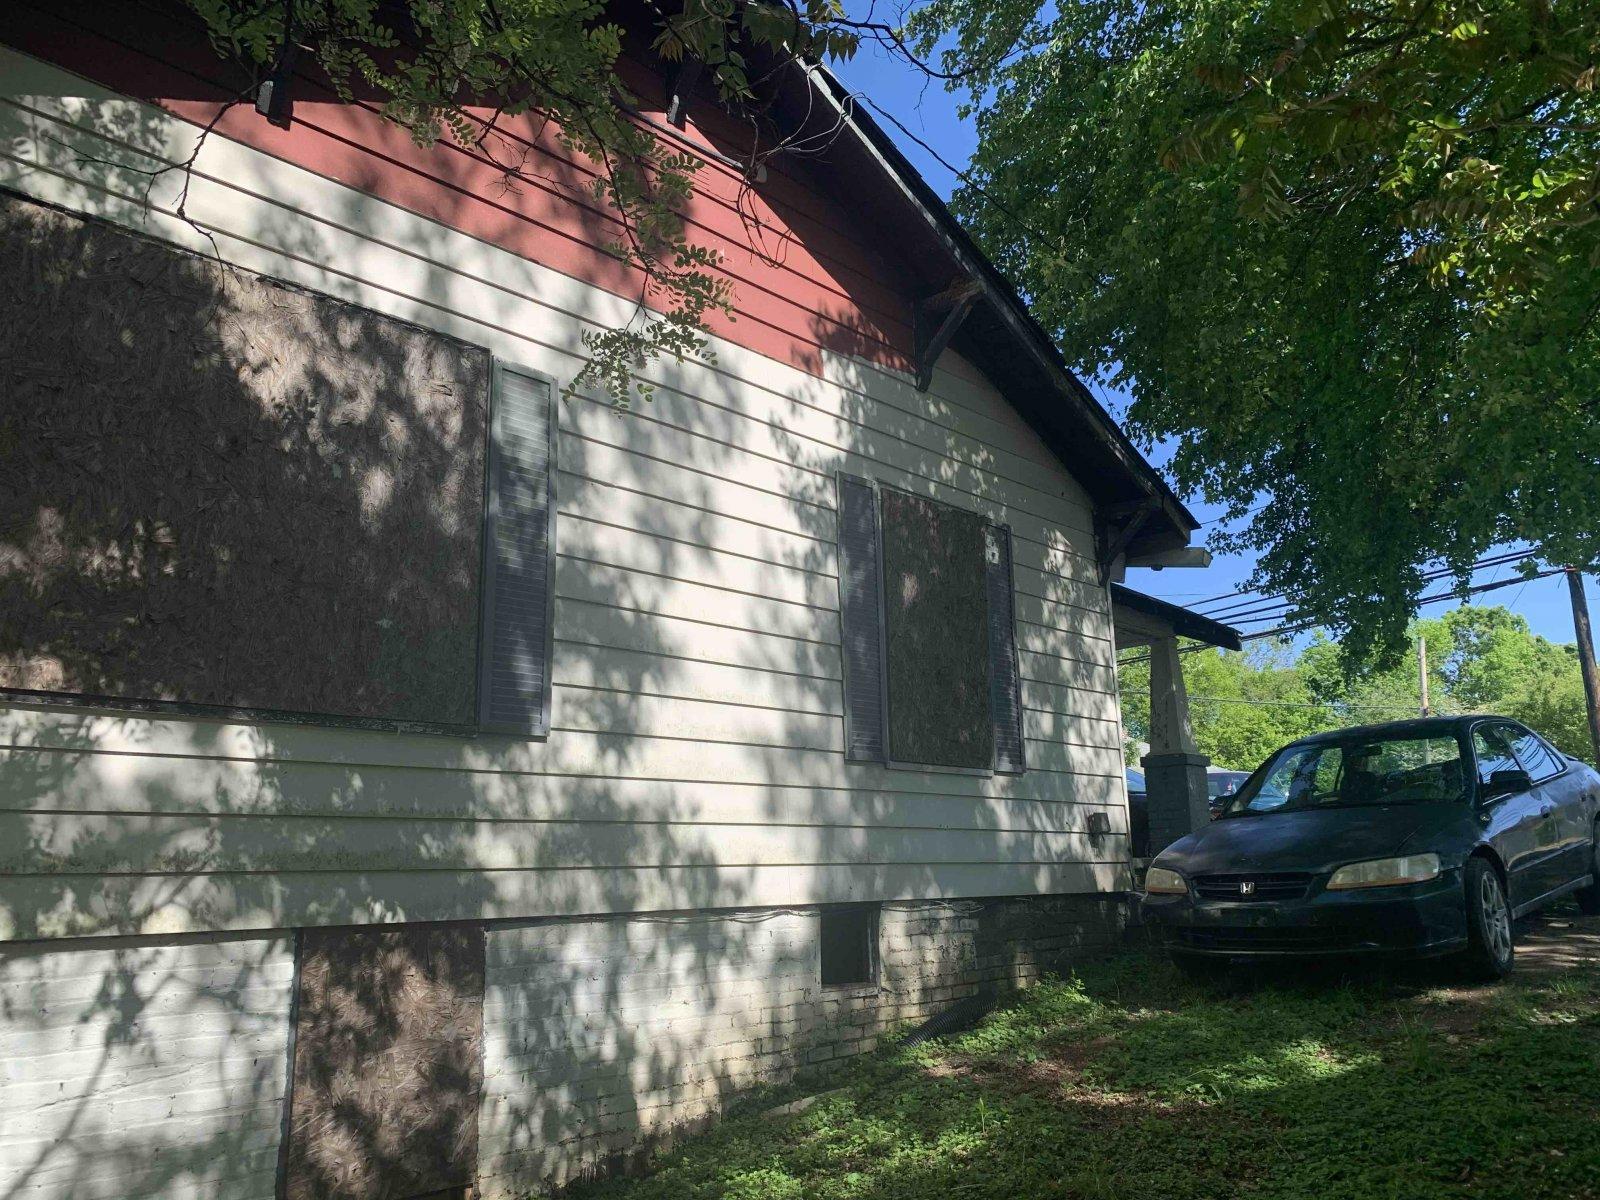 triad-discount-homes-off-market-property-for-sale-Winston-Salem-NC